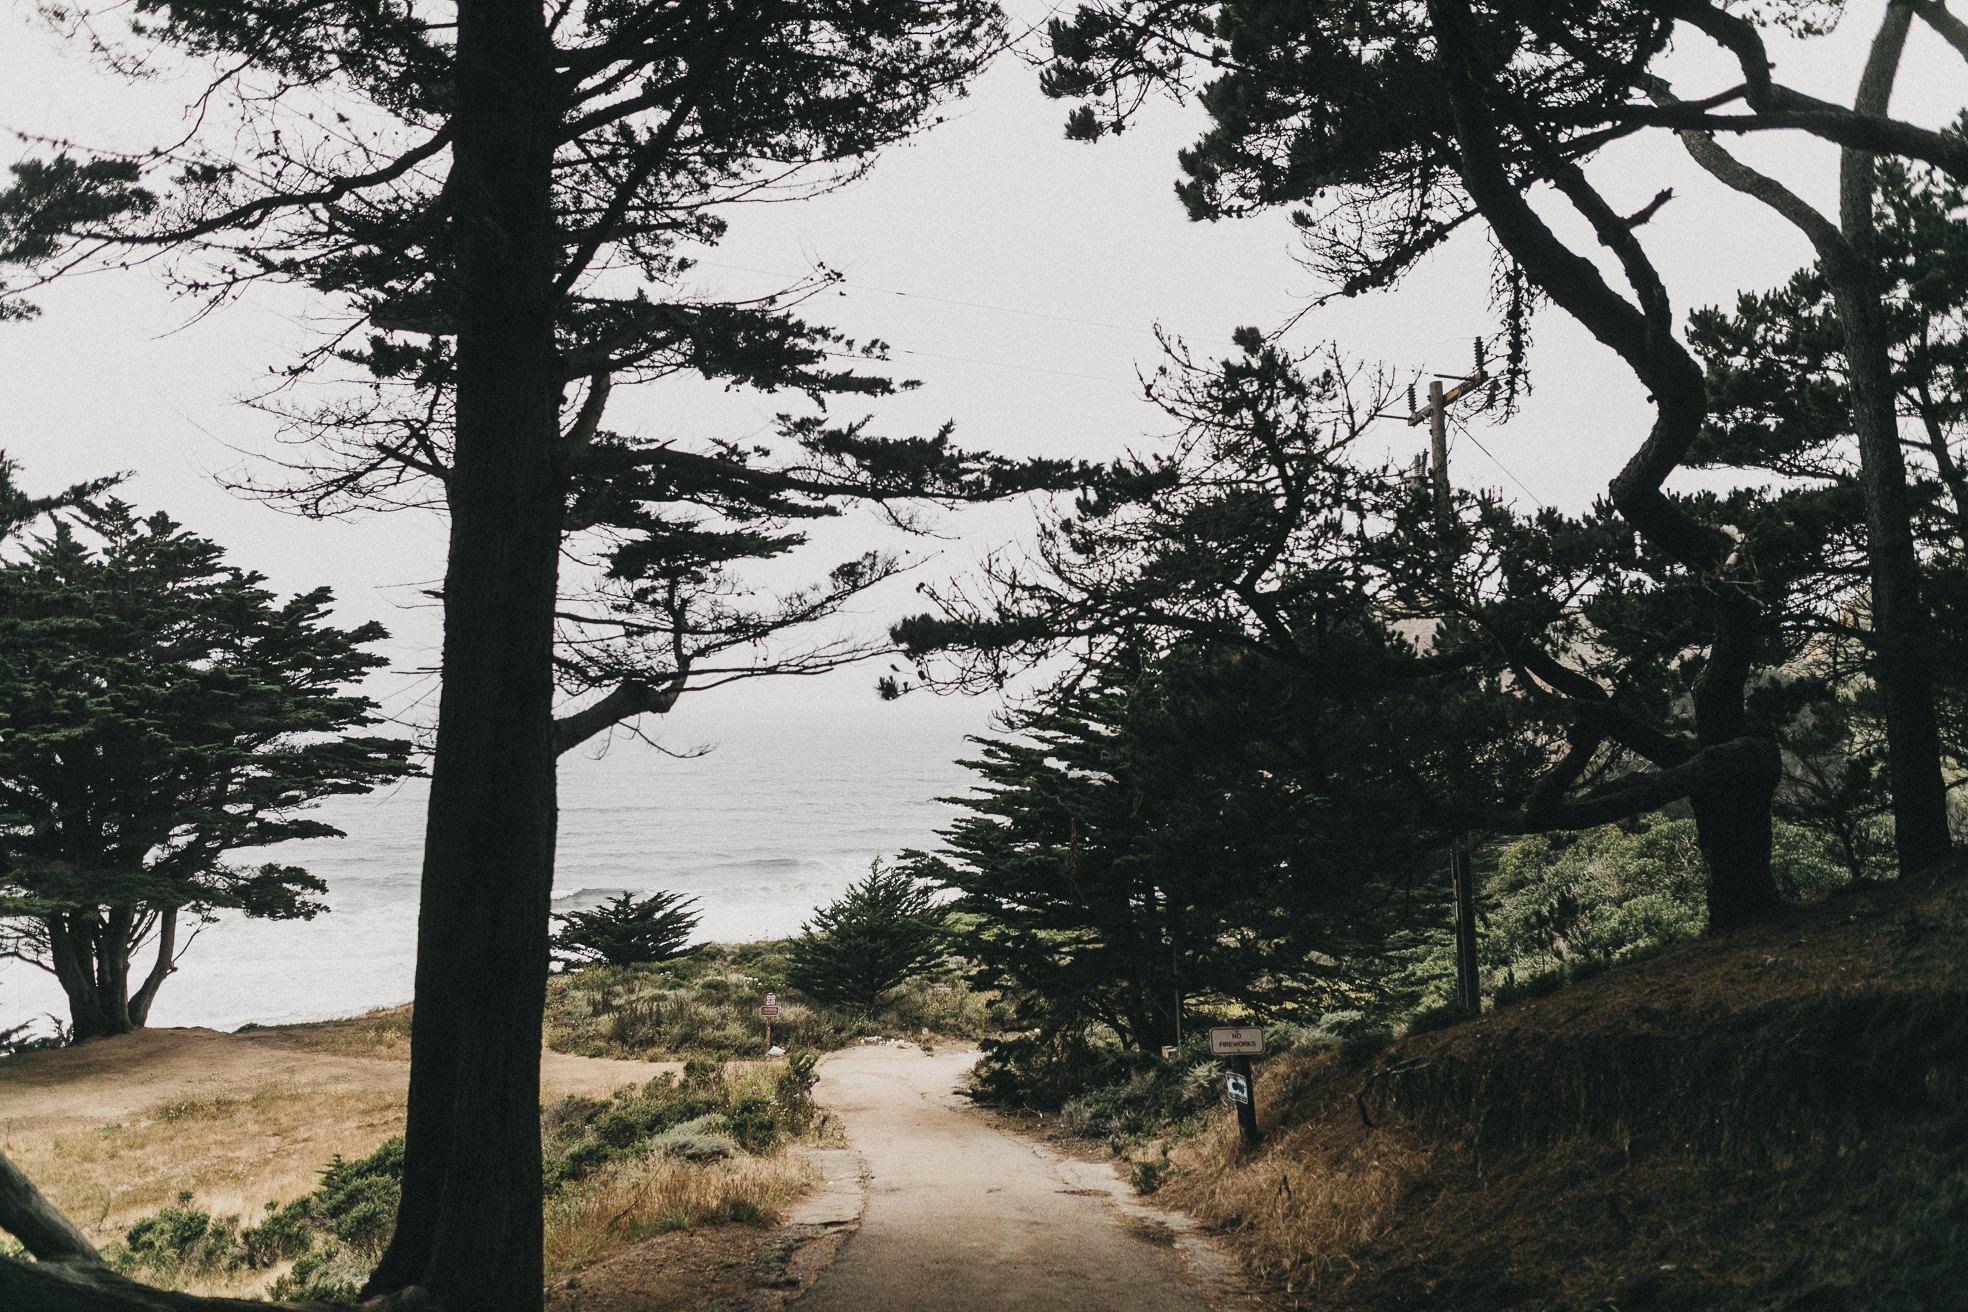 San-Francisco-BildervomLeben-9883